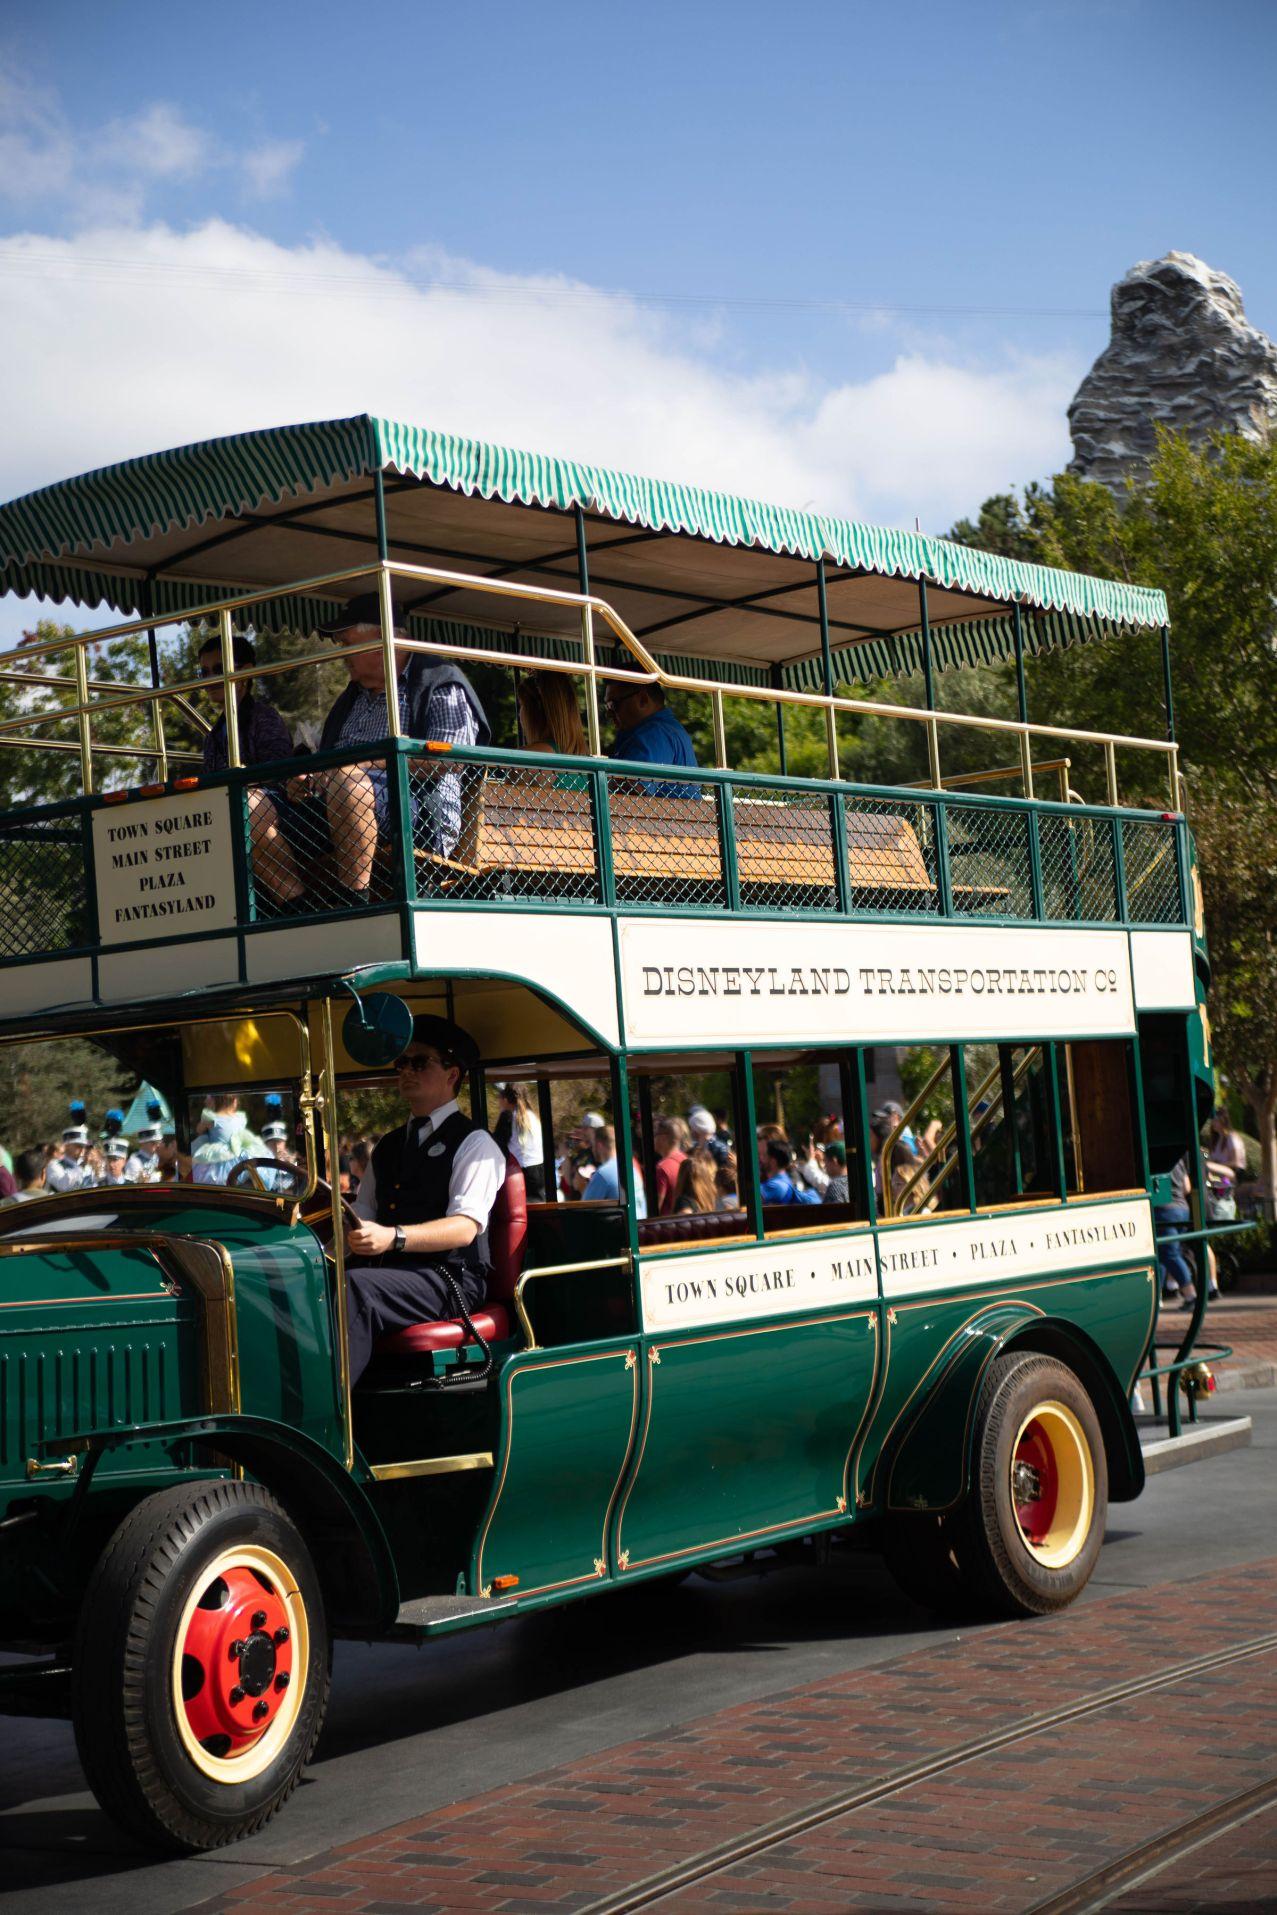 Disneyland The Ultimate Travel Guide by Annie Fairfax Disneyland Travel Tips Advice Mainstream, USA